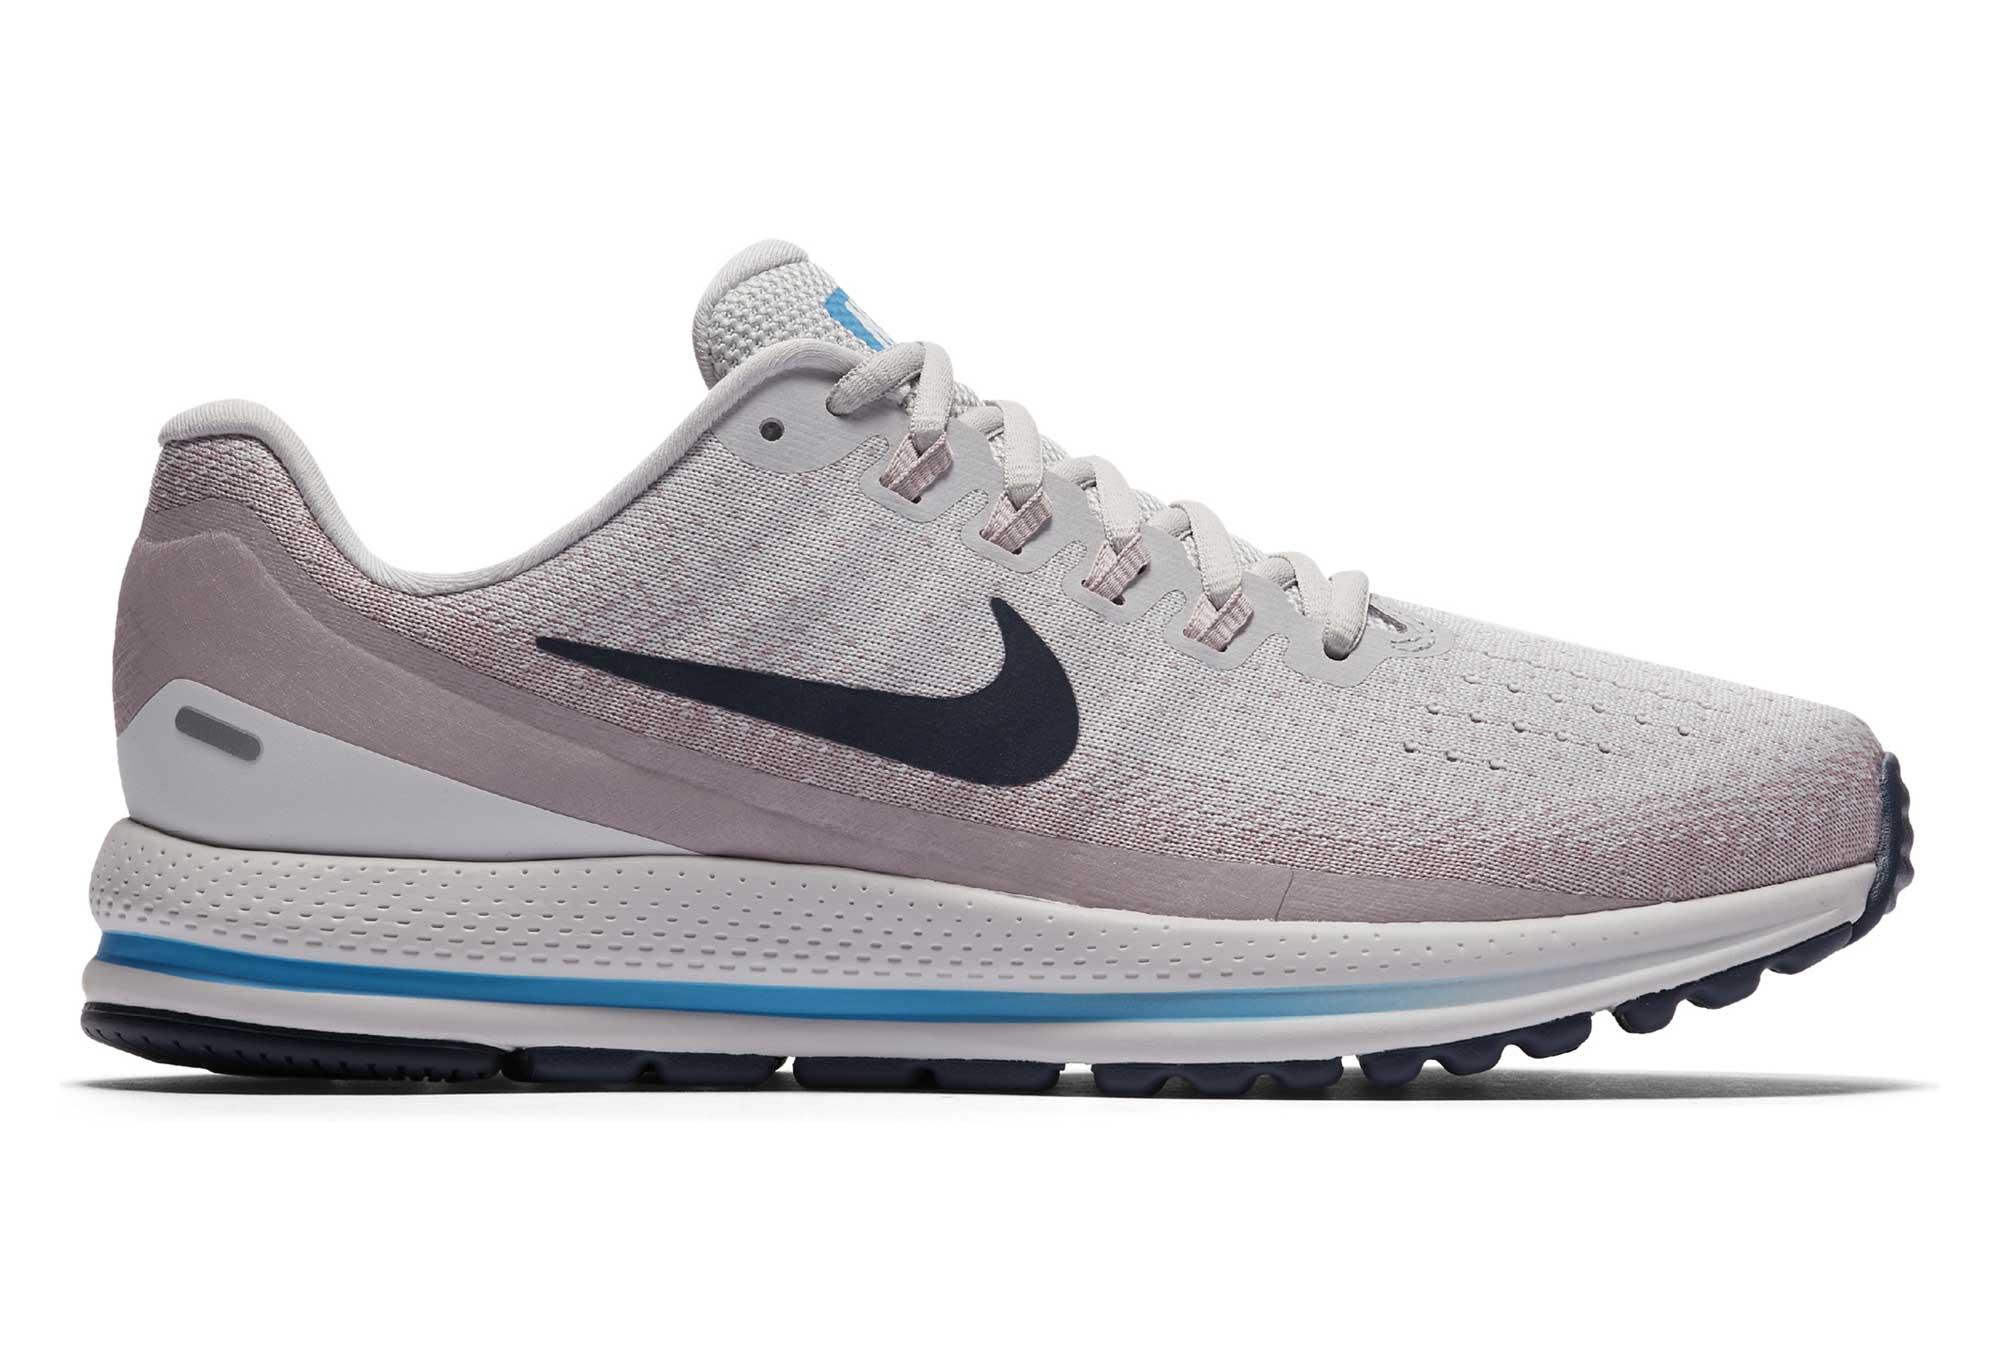 6de5cf434 Nike Air Zoom Vomero 13 Rosa Gris Azul Mujeres | Alltricks.es